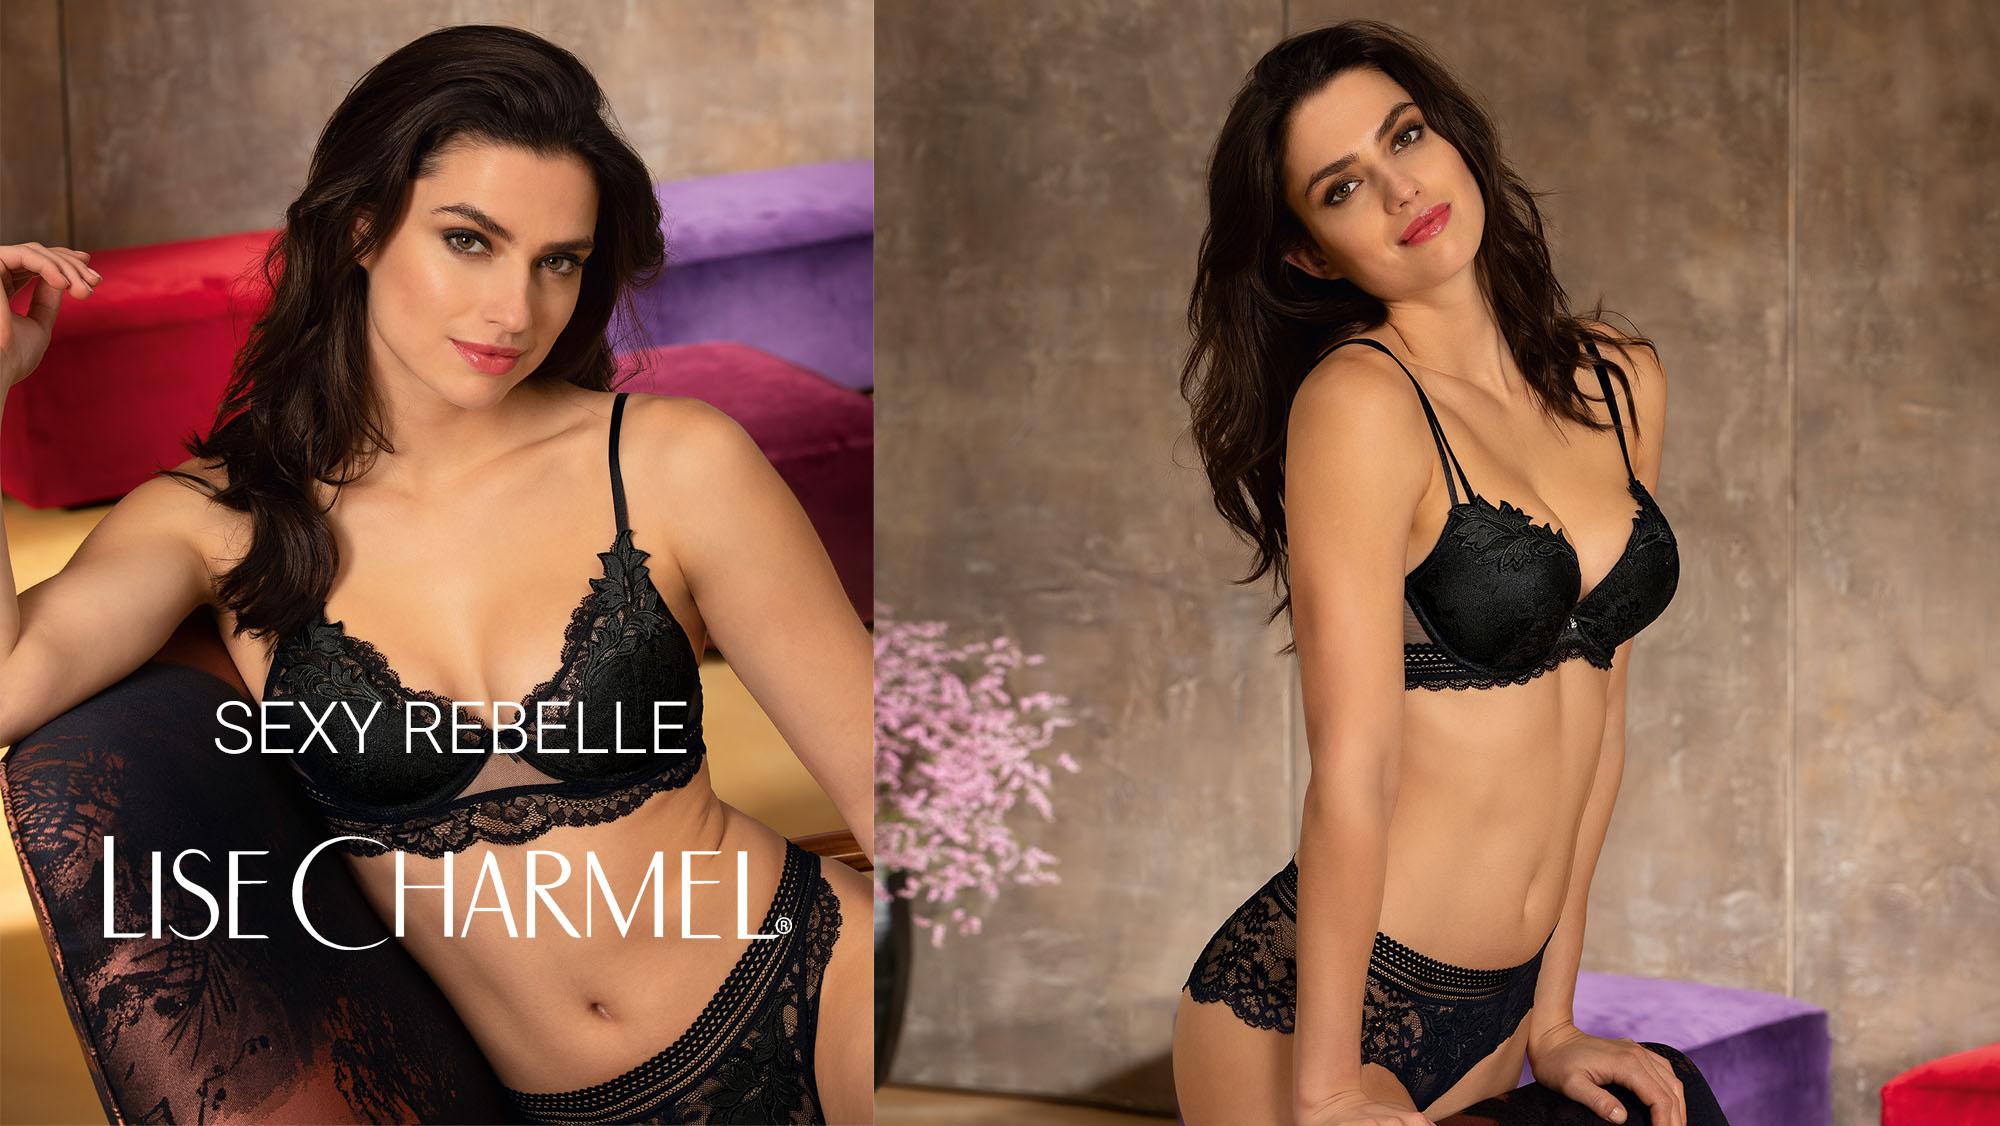 Lise Charmel Sexy Rebelle